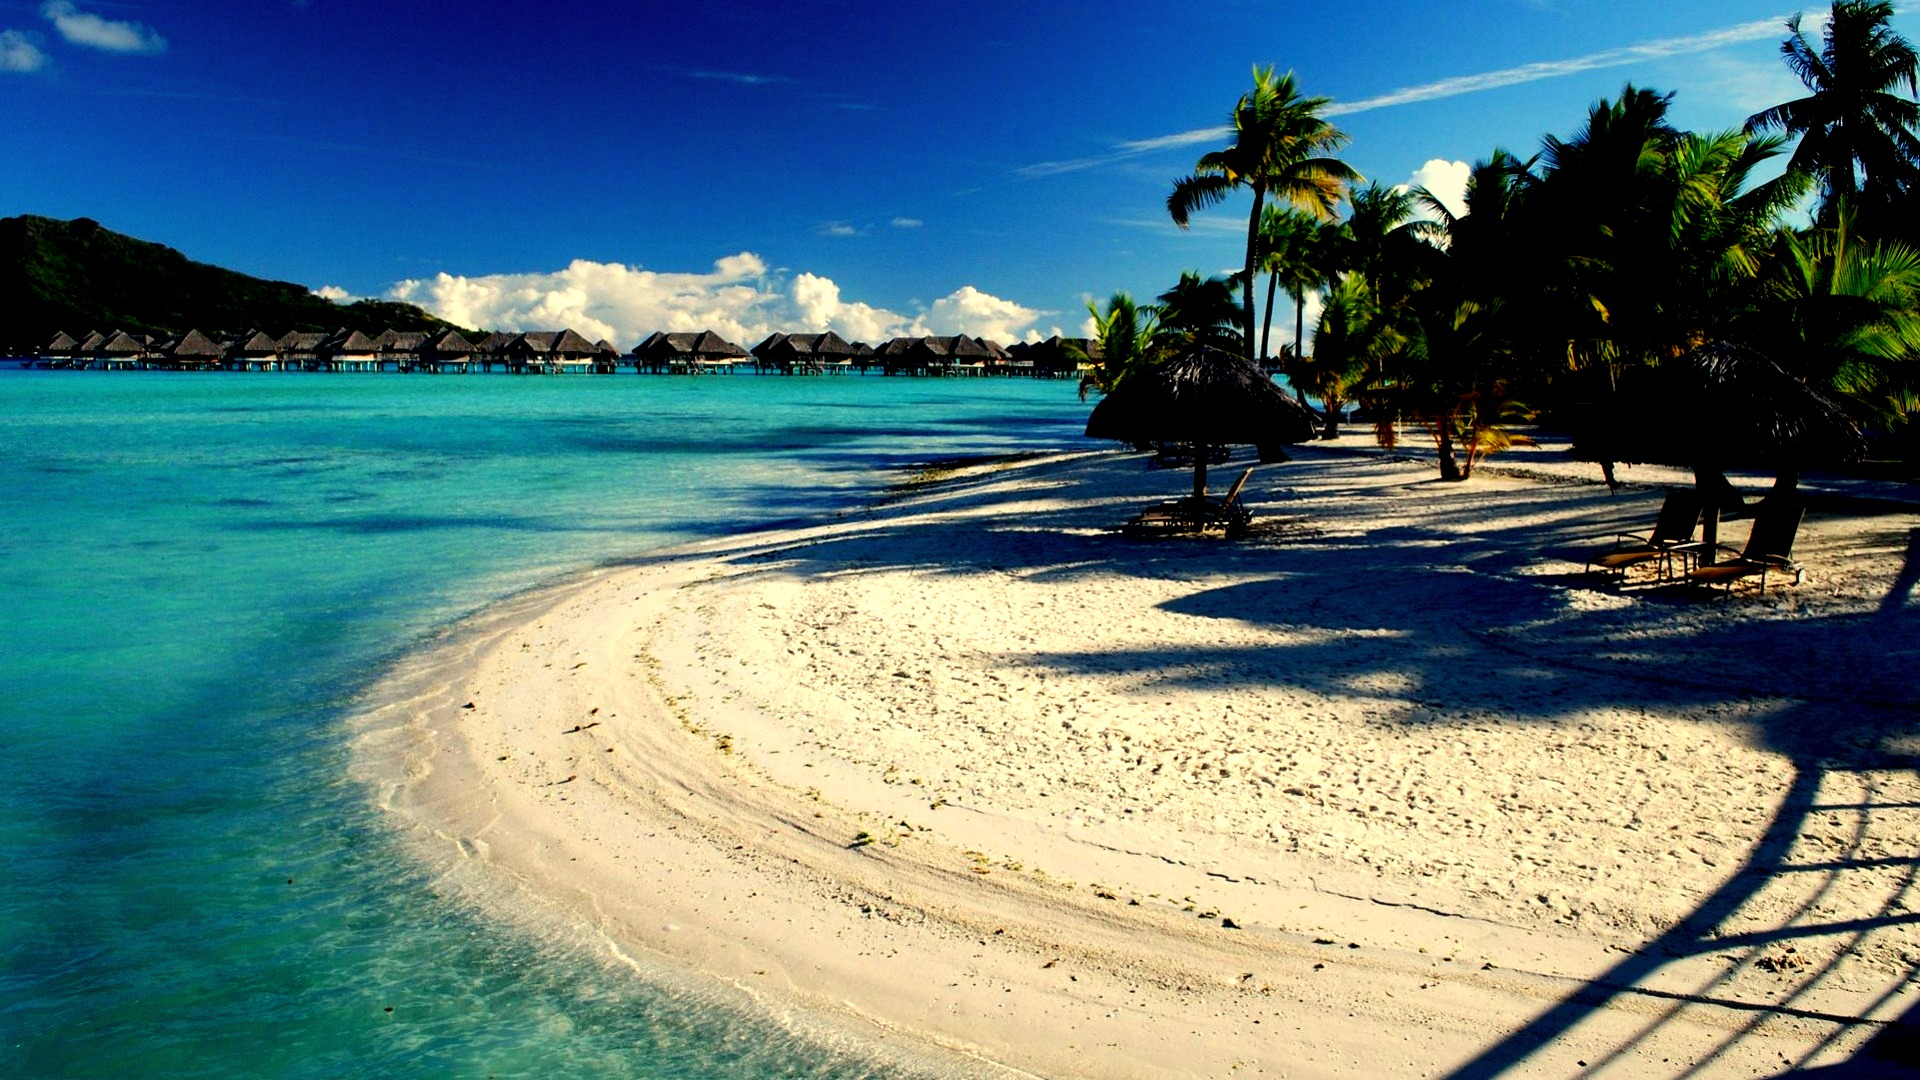 Spiagge full hd sfondo and sfondo 1920x1080 id 402164 for Immagini full hd 1920x1080